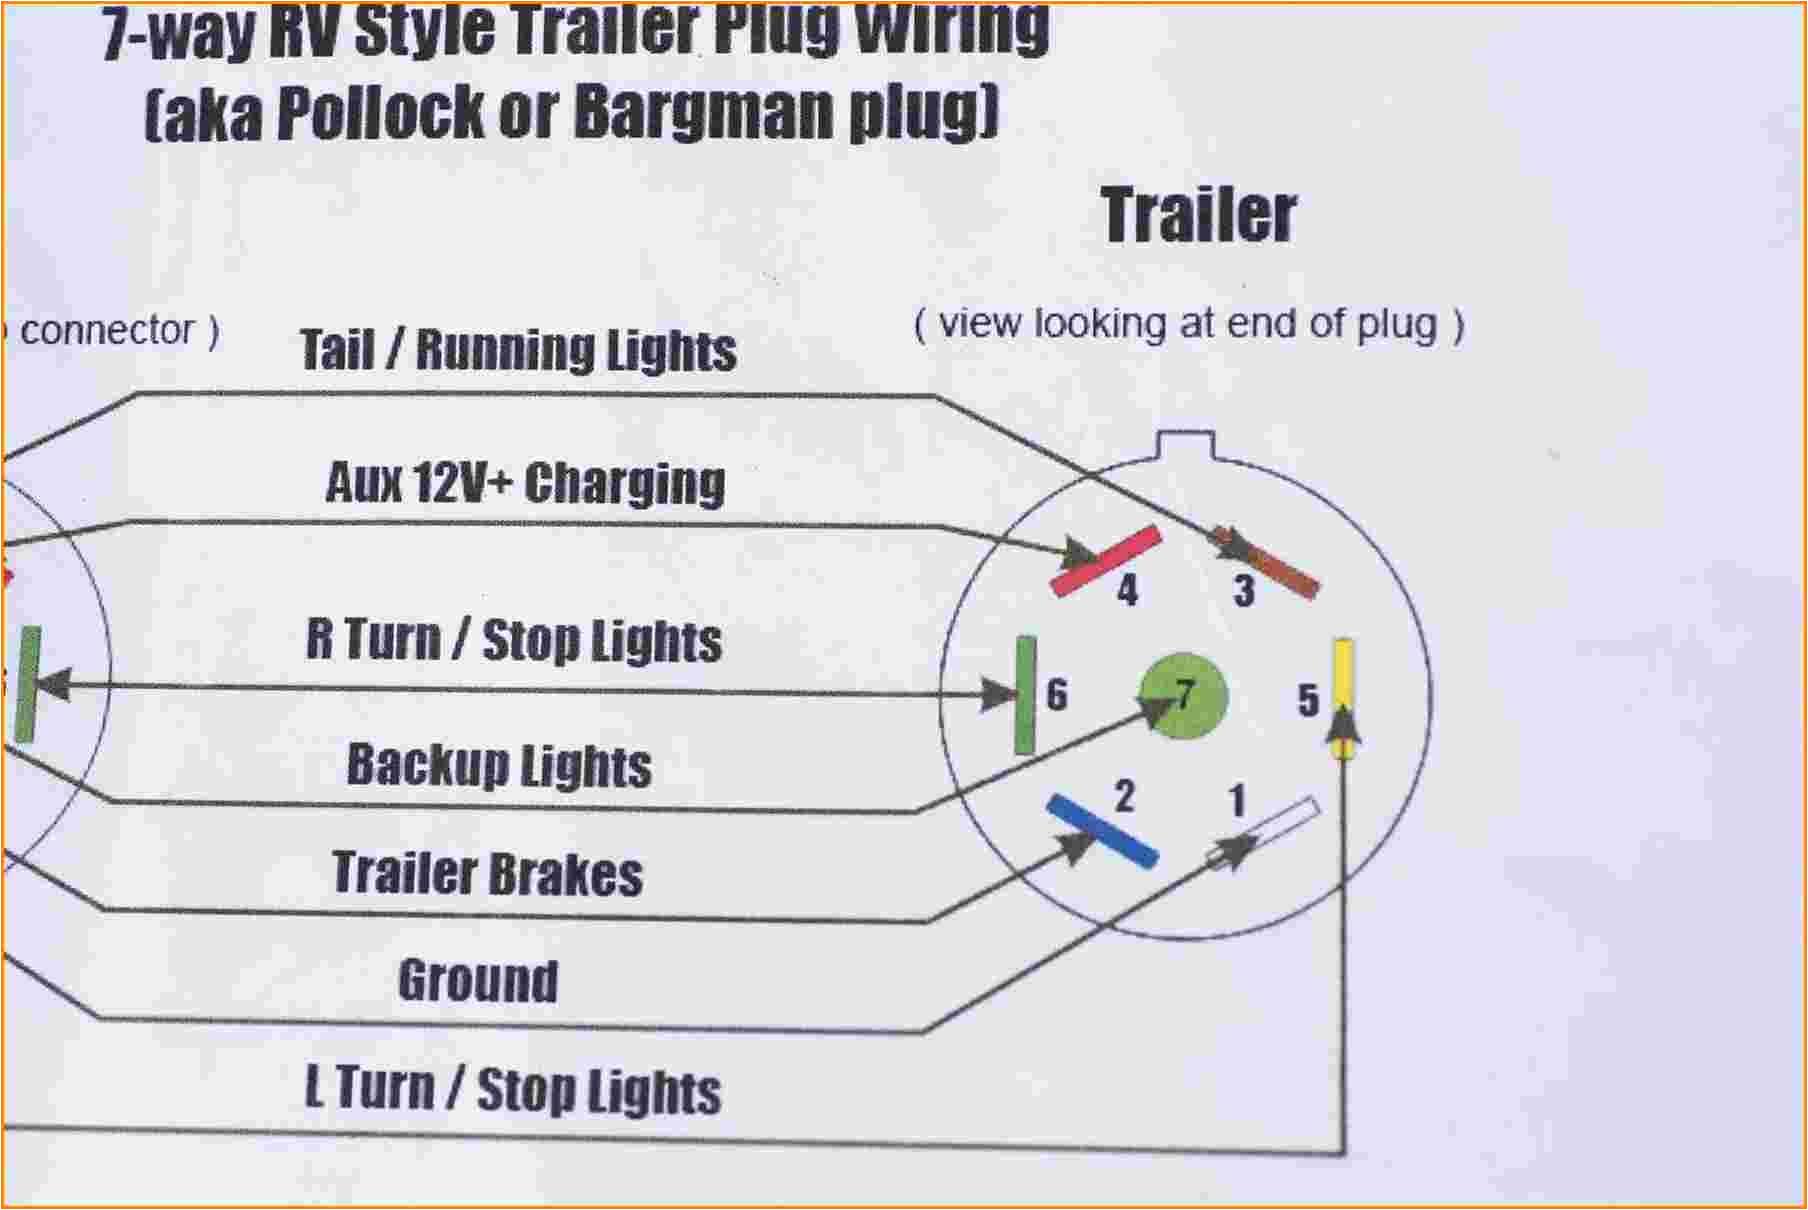 ford f 250 trailer plug wiring diagram 7 pin wiring diagram page 2004 ford f 250 trailer wiring harness diagram